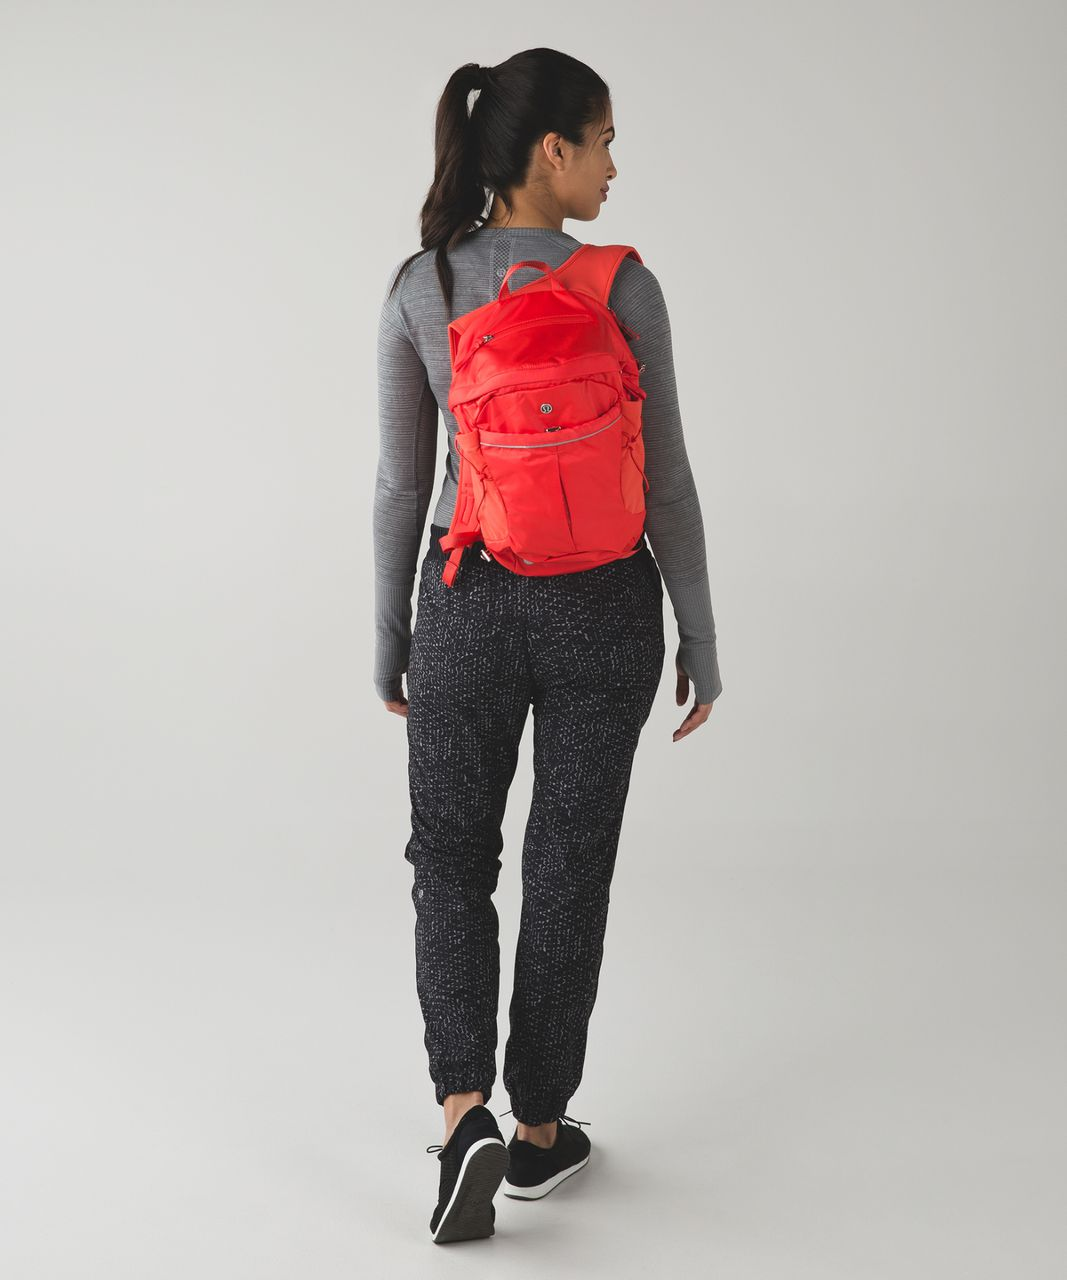 Lululemon Run All Day Backpack - Alarming